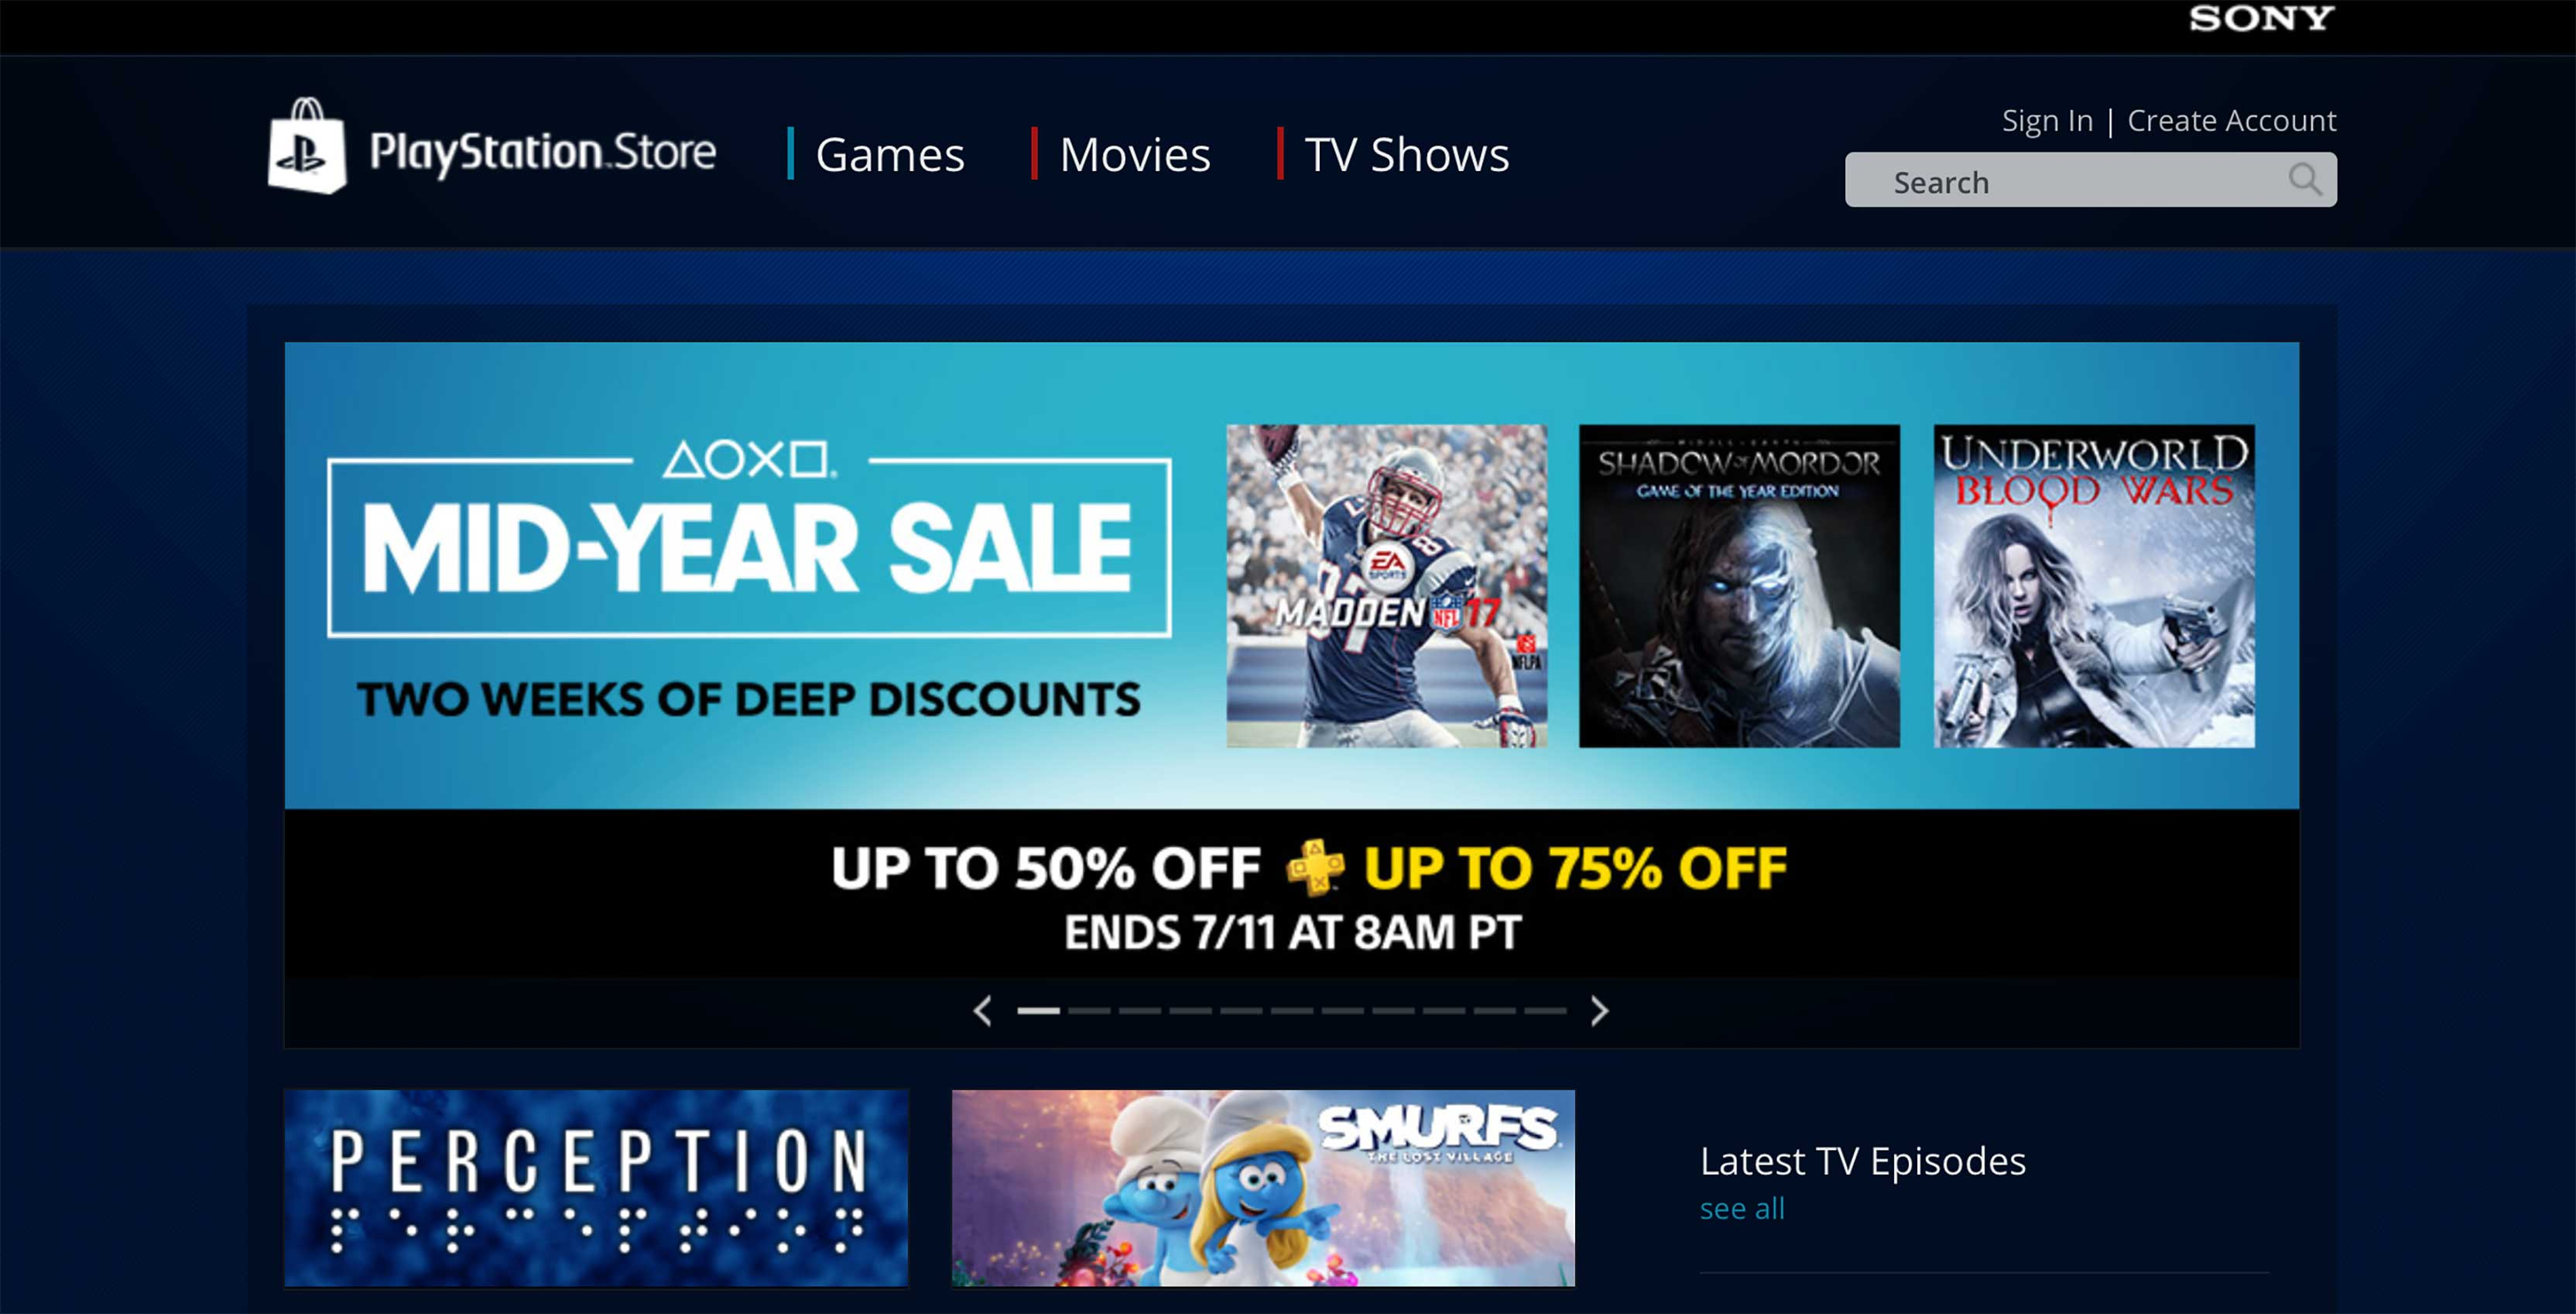 PlayStation Store digital games